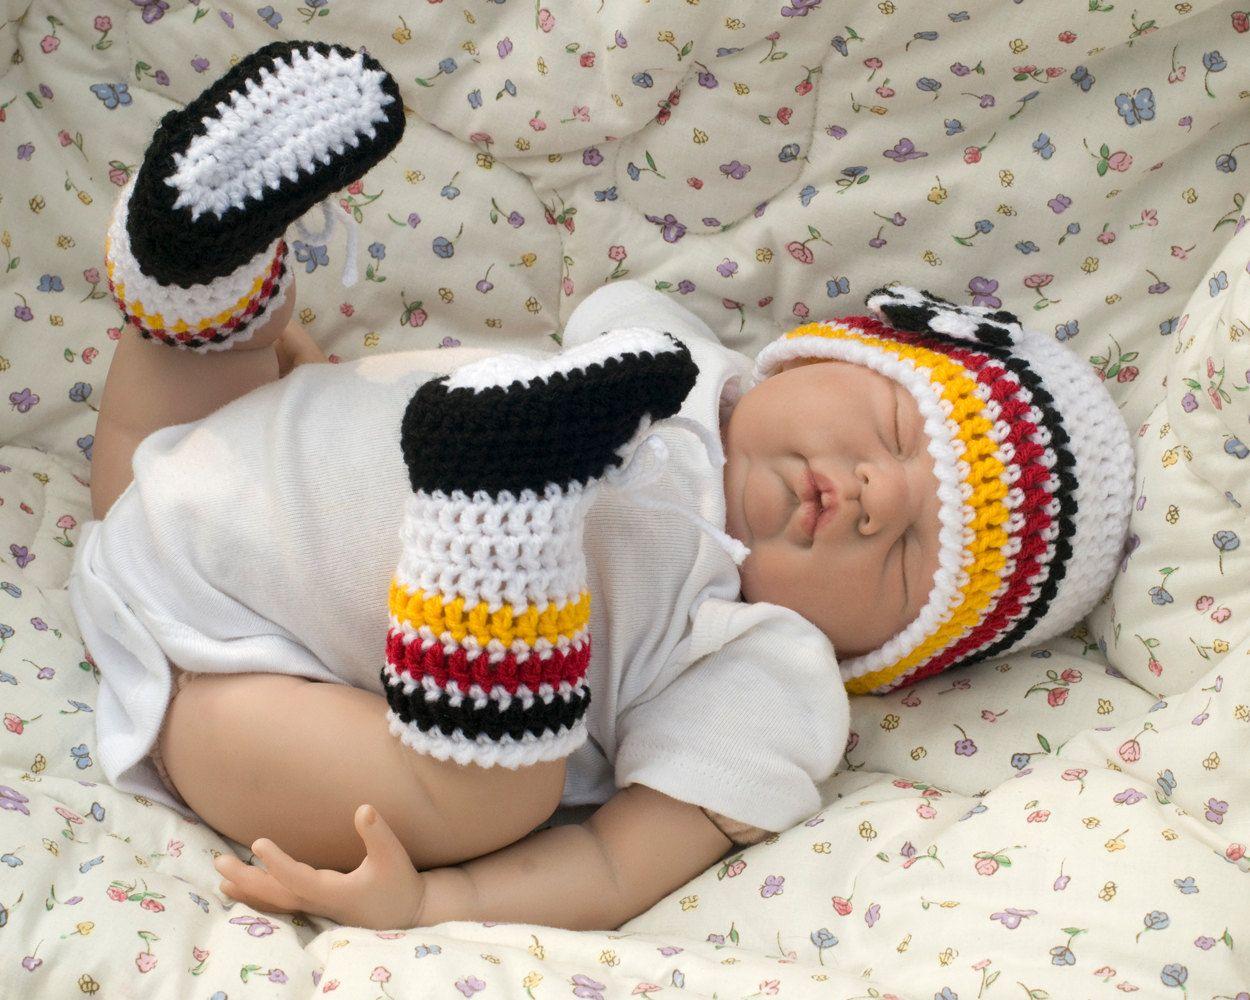 Germany baby soccer world cup crochet soccer leg warmers